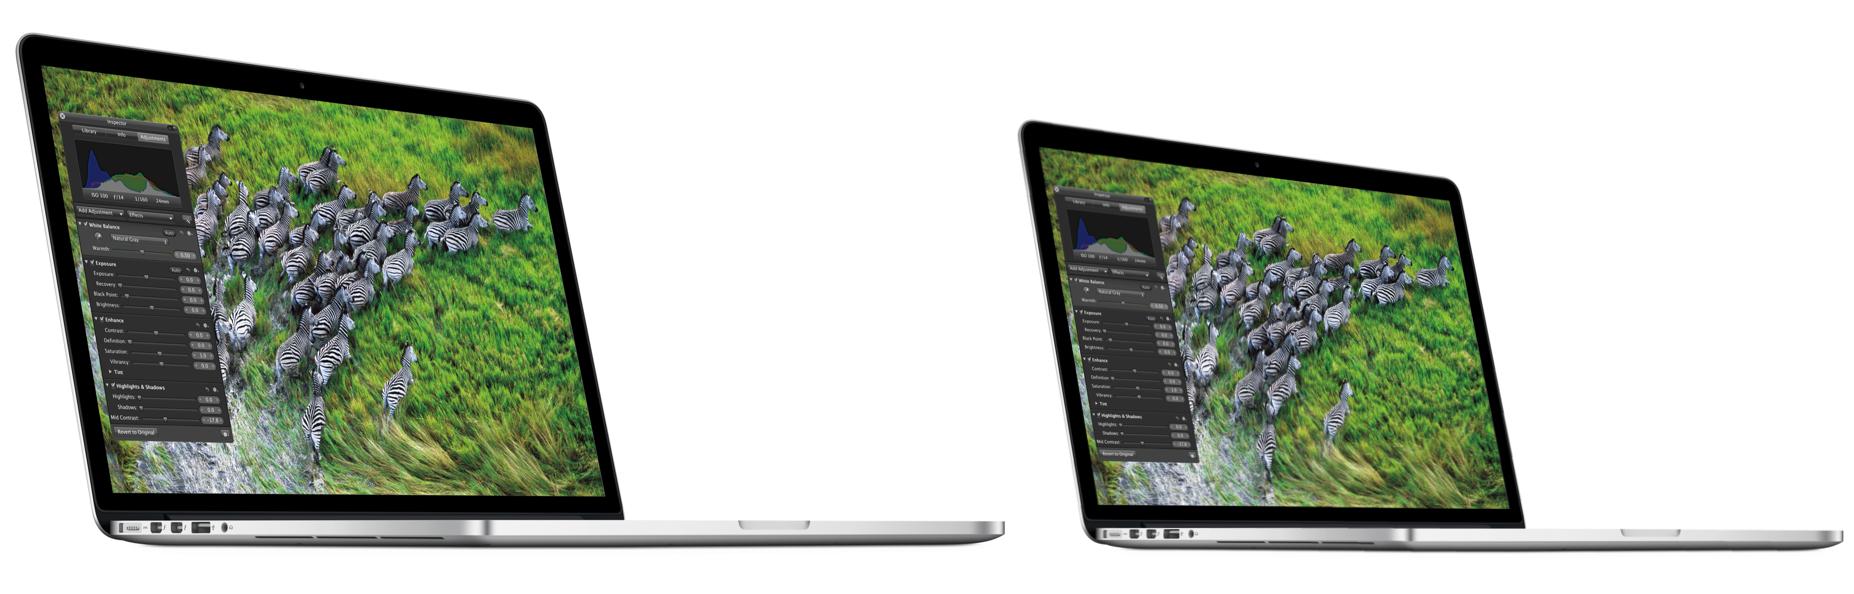 macbook-pro-retina-231012